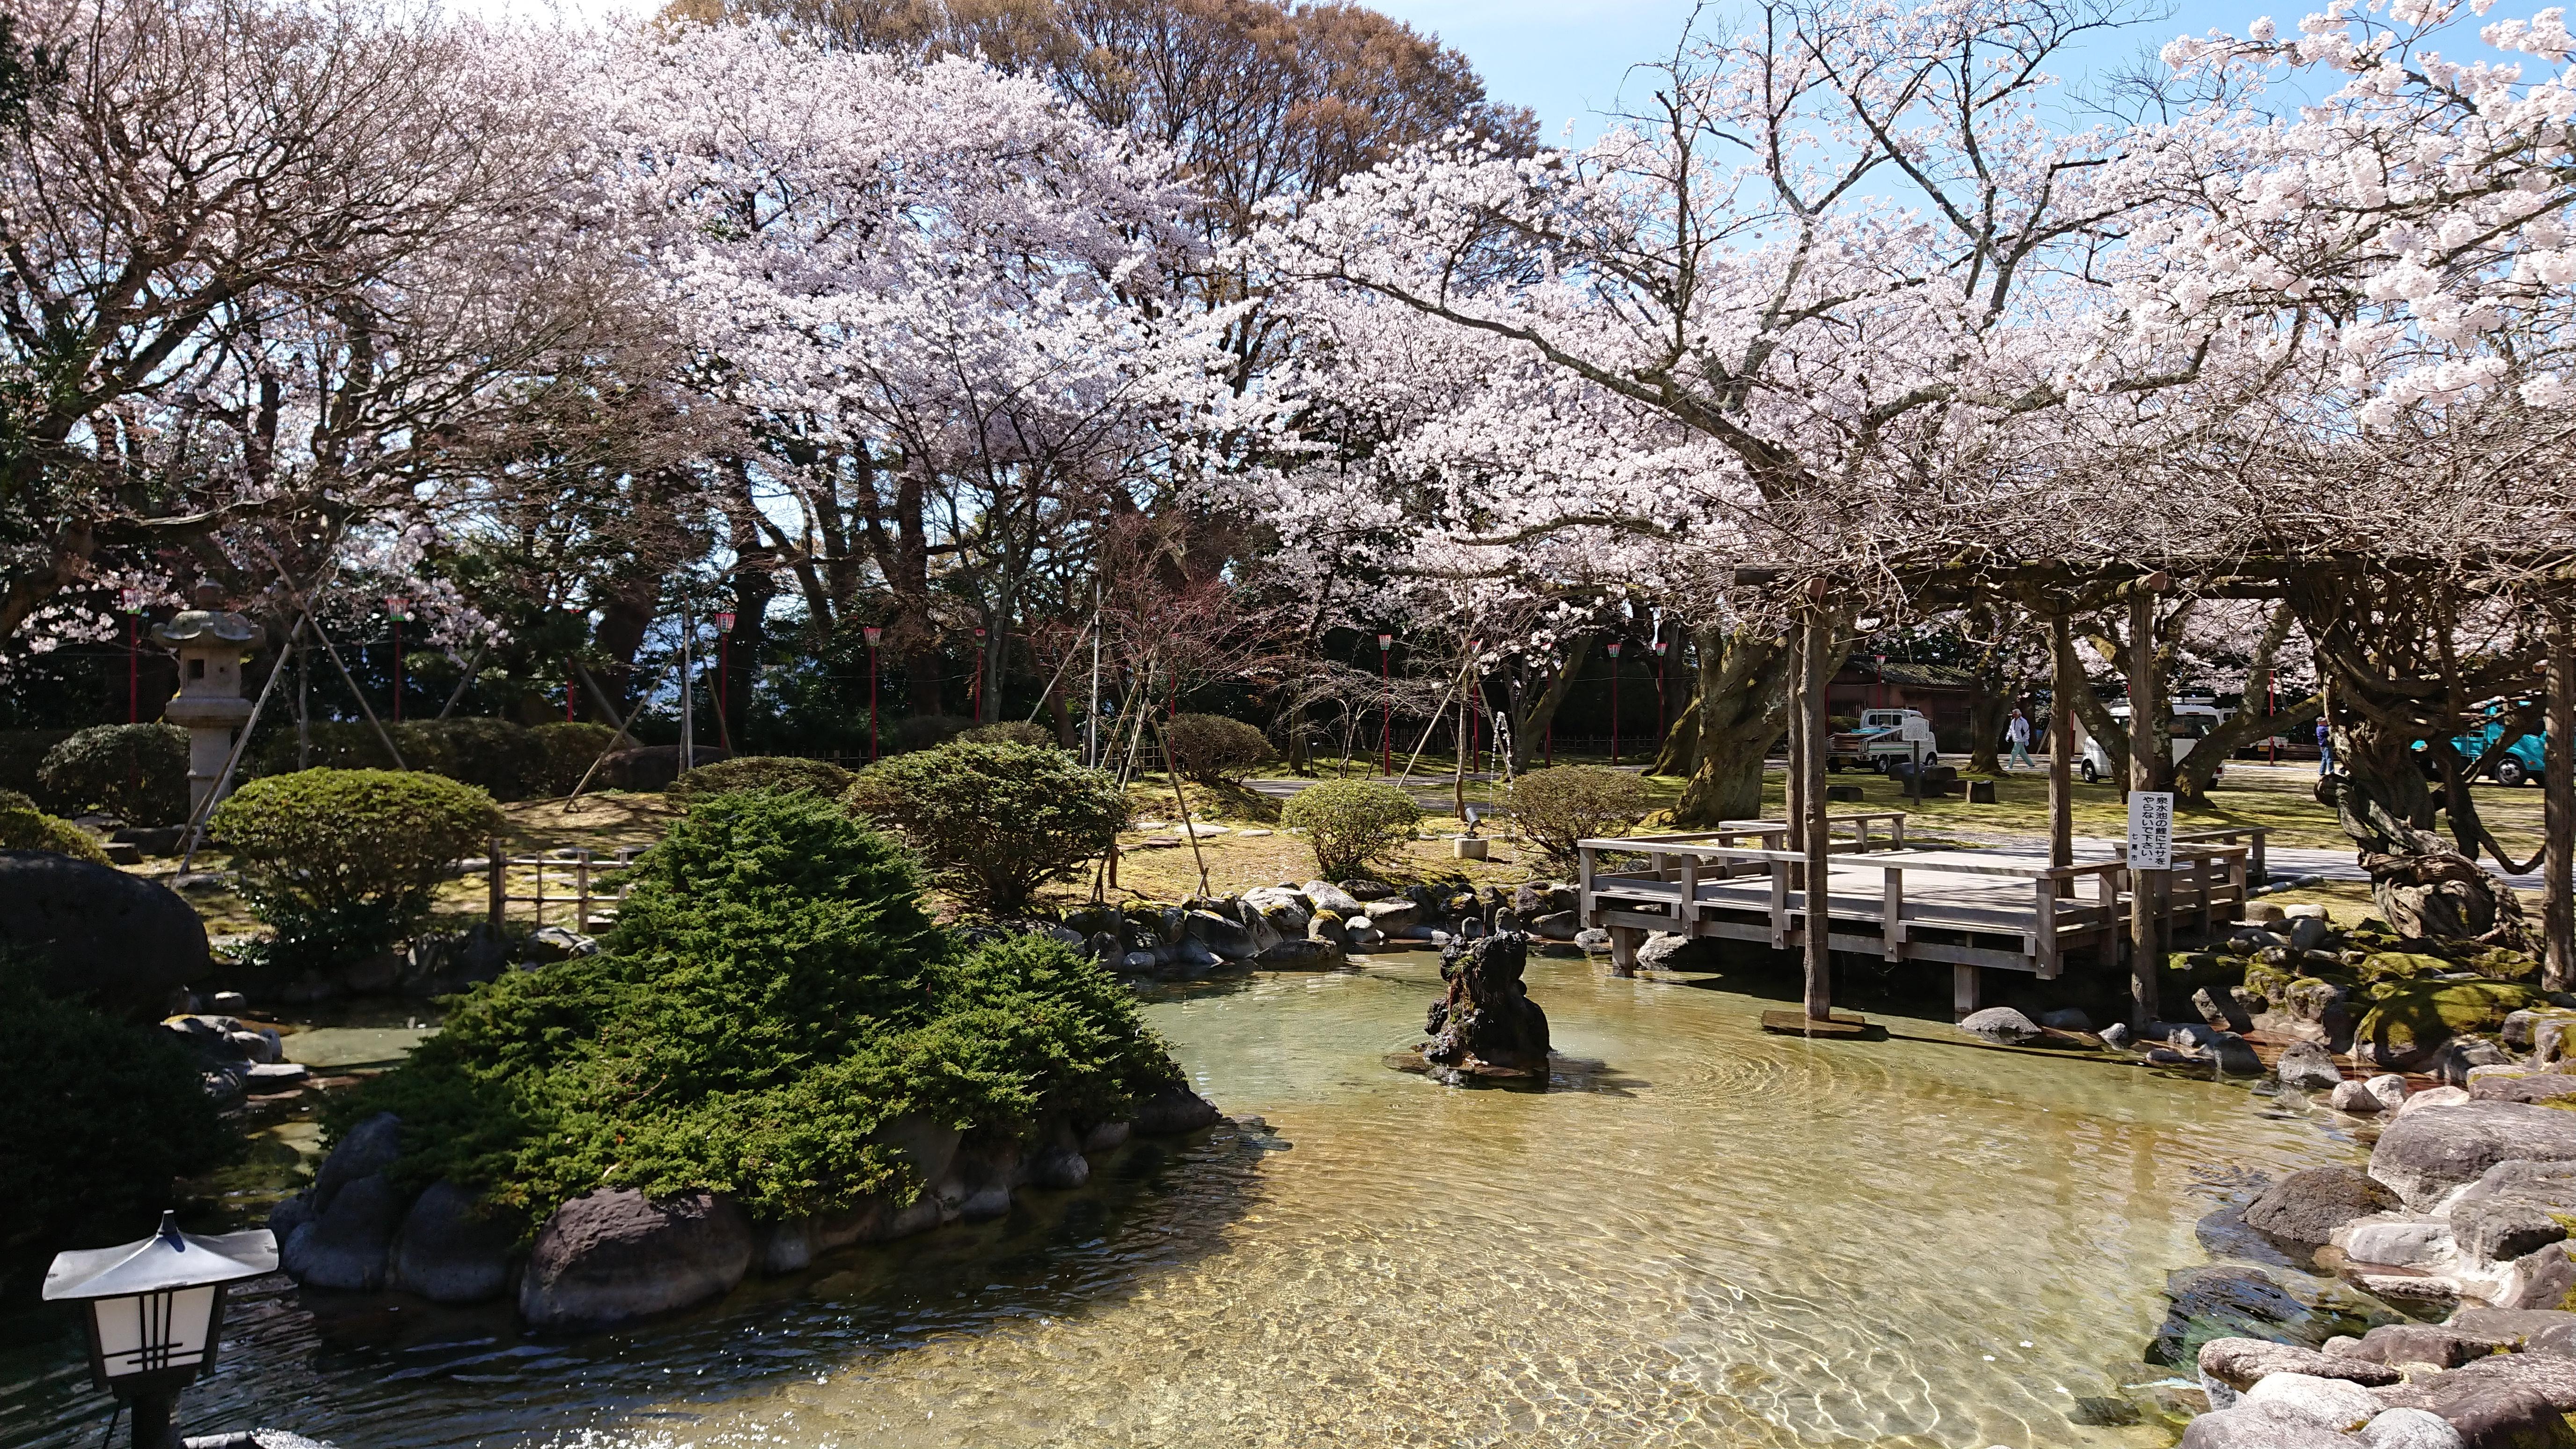 [Noto] Komaruyama Castle Ruins Park